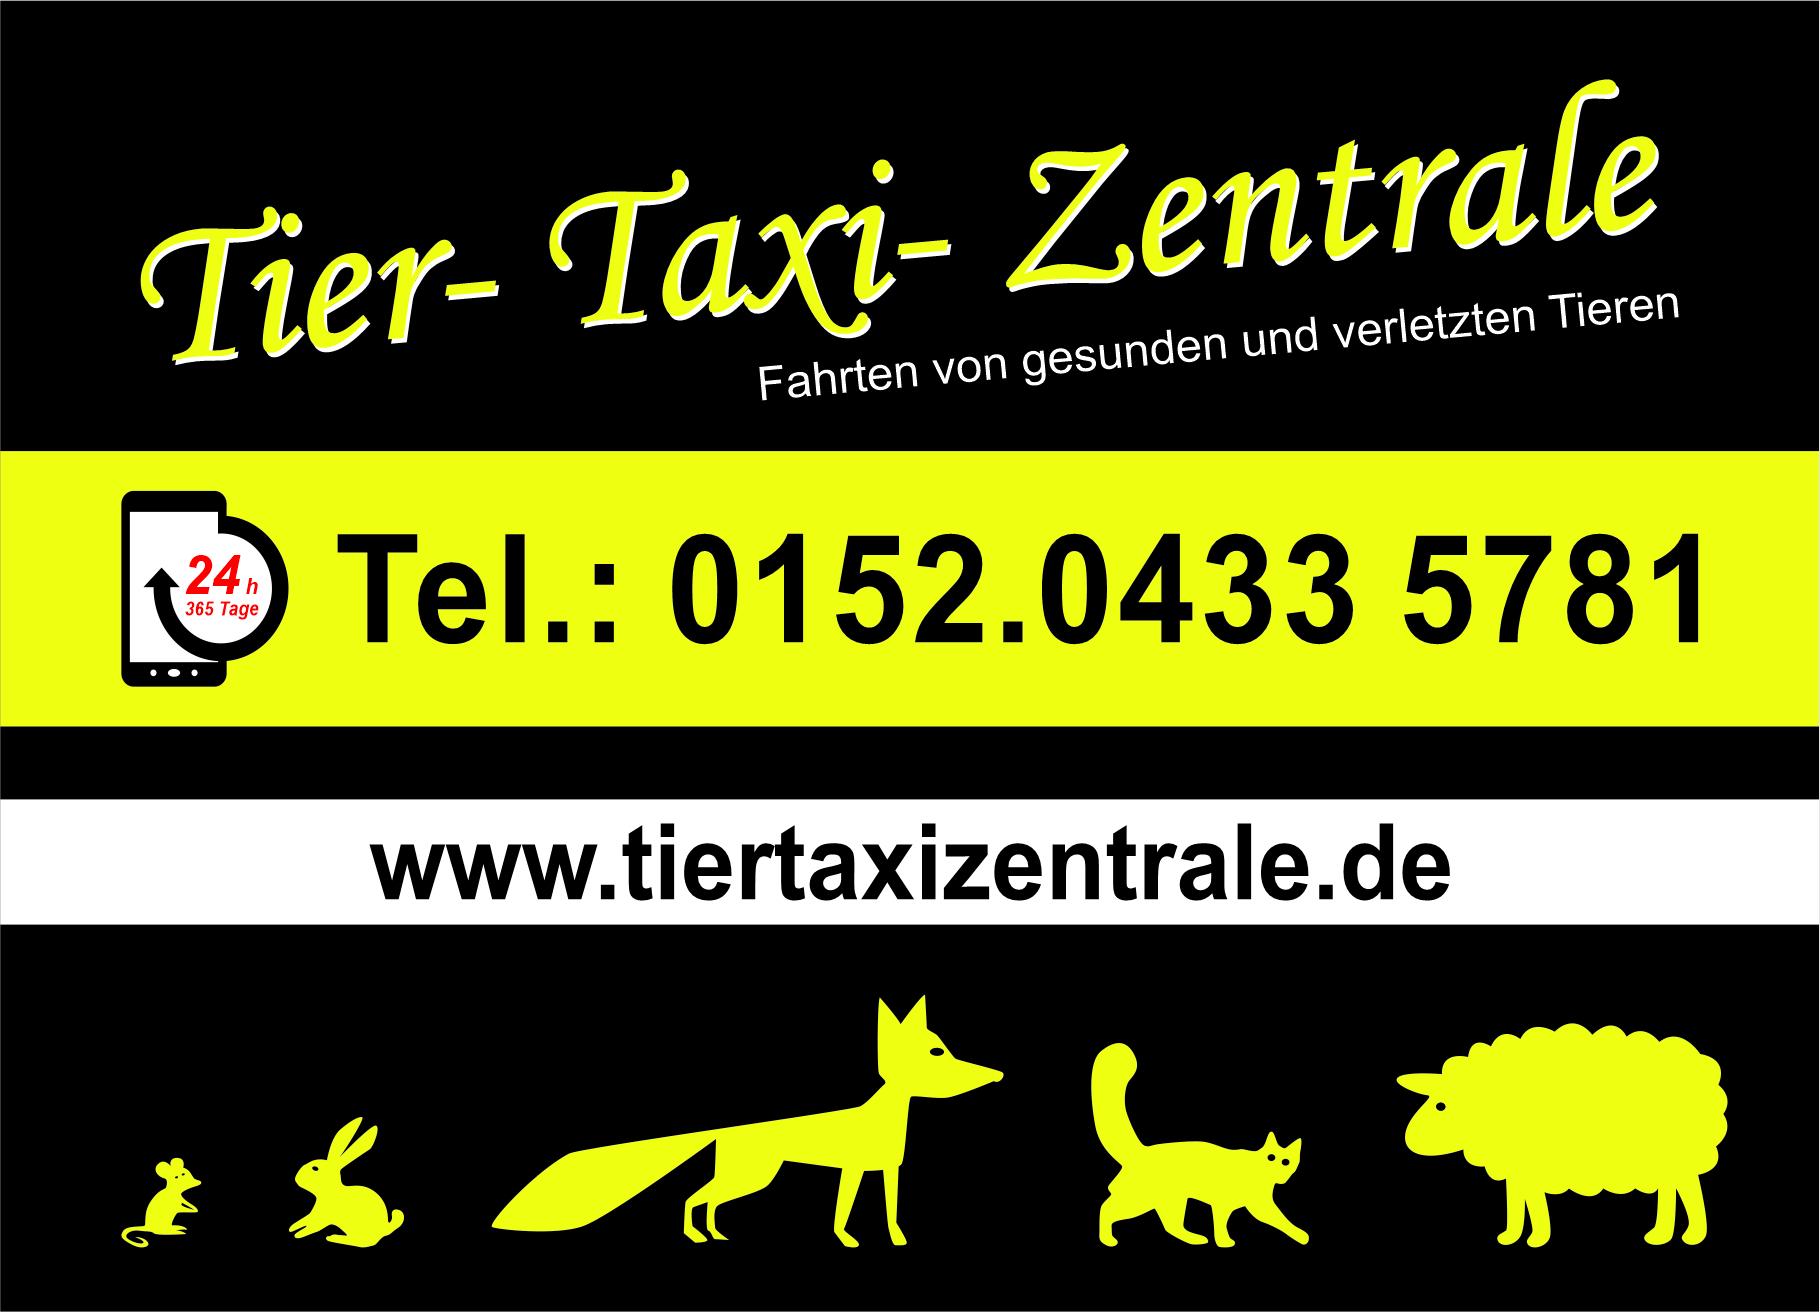 Tier- Taxi- Zentrale